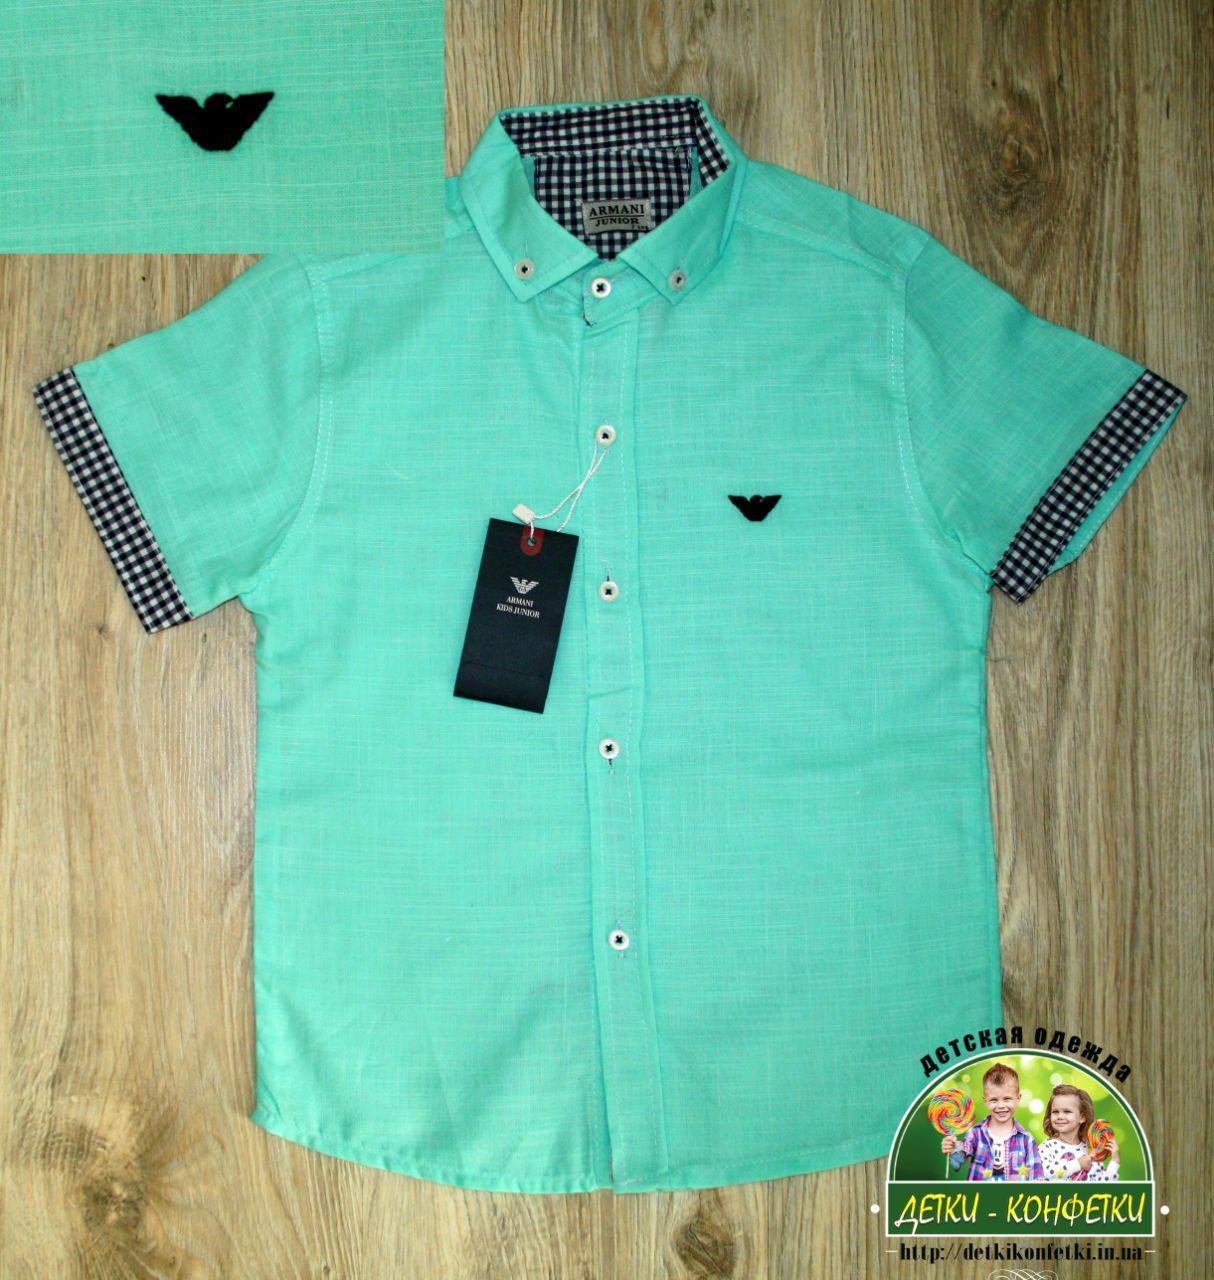 Мятная рубашка Armani с коротким рукавом для мальчика